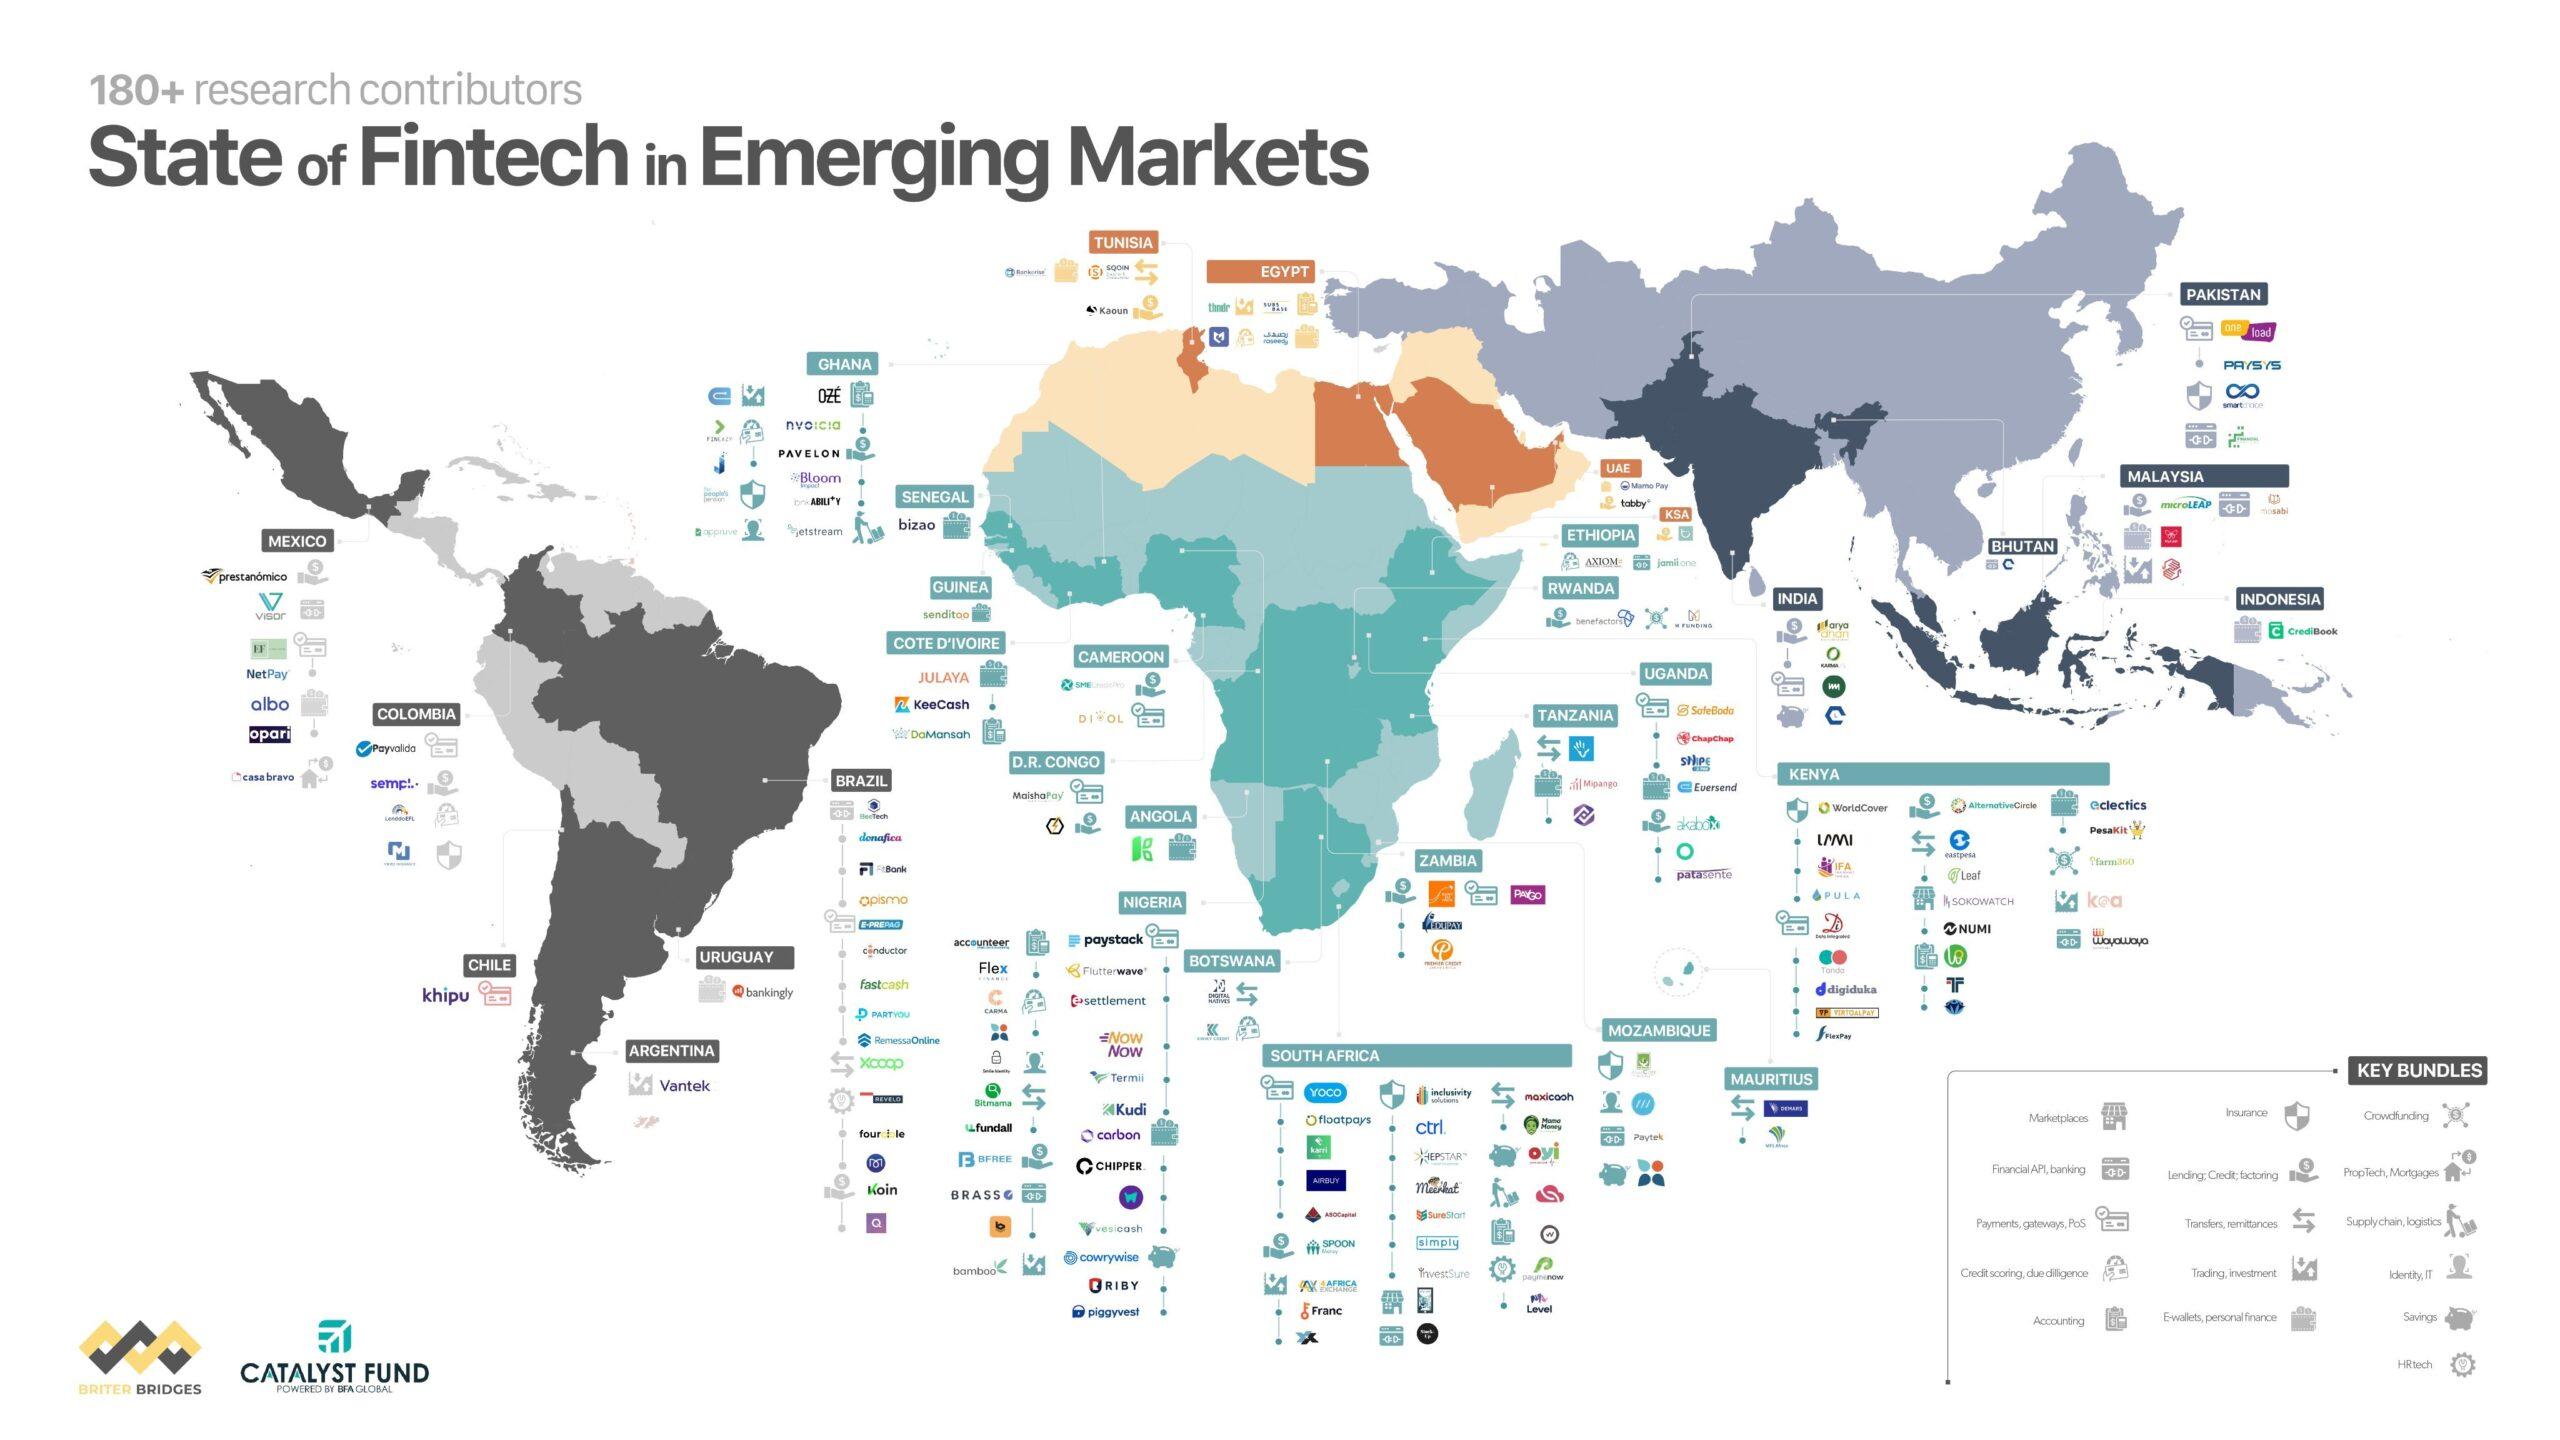 Mapa del estado de las fintech en mercados emergentes incluyendo empresas fintech en México